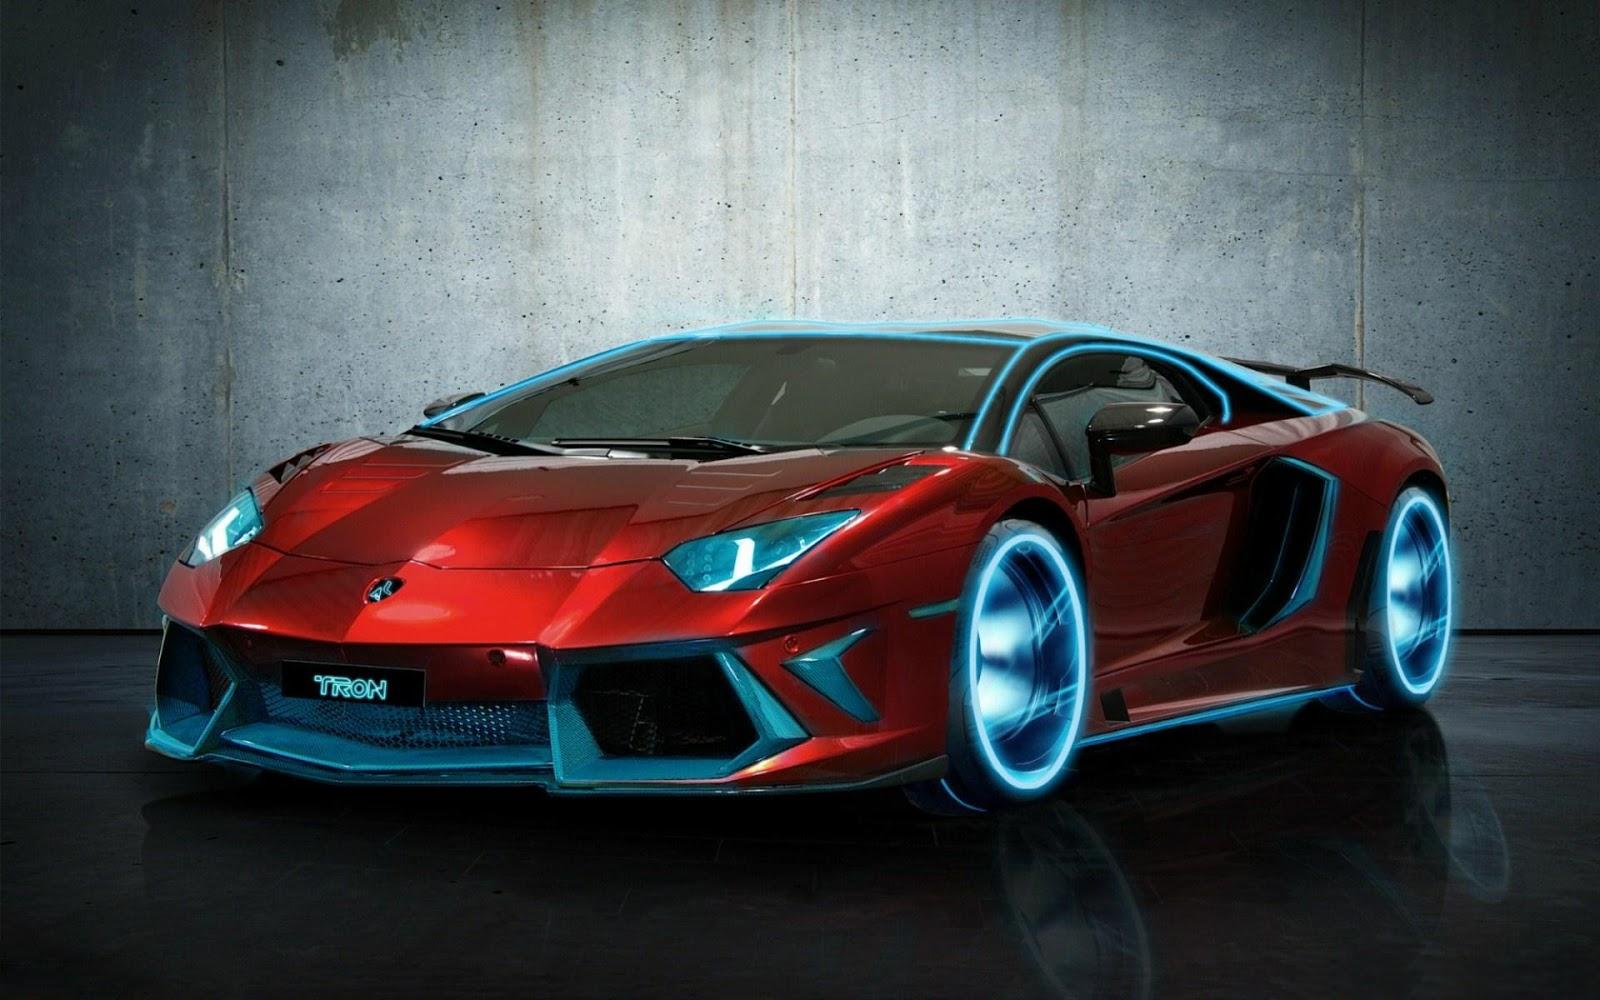 Cool Cars Lamborghini Neon Sports Car Wallpaper